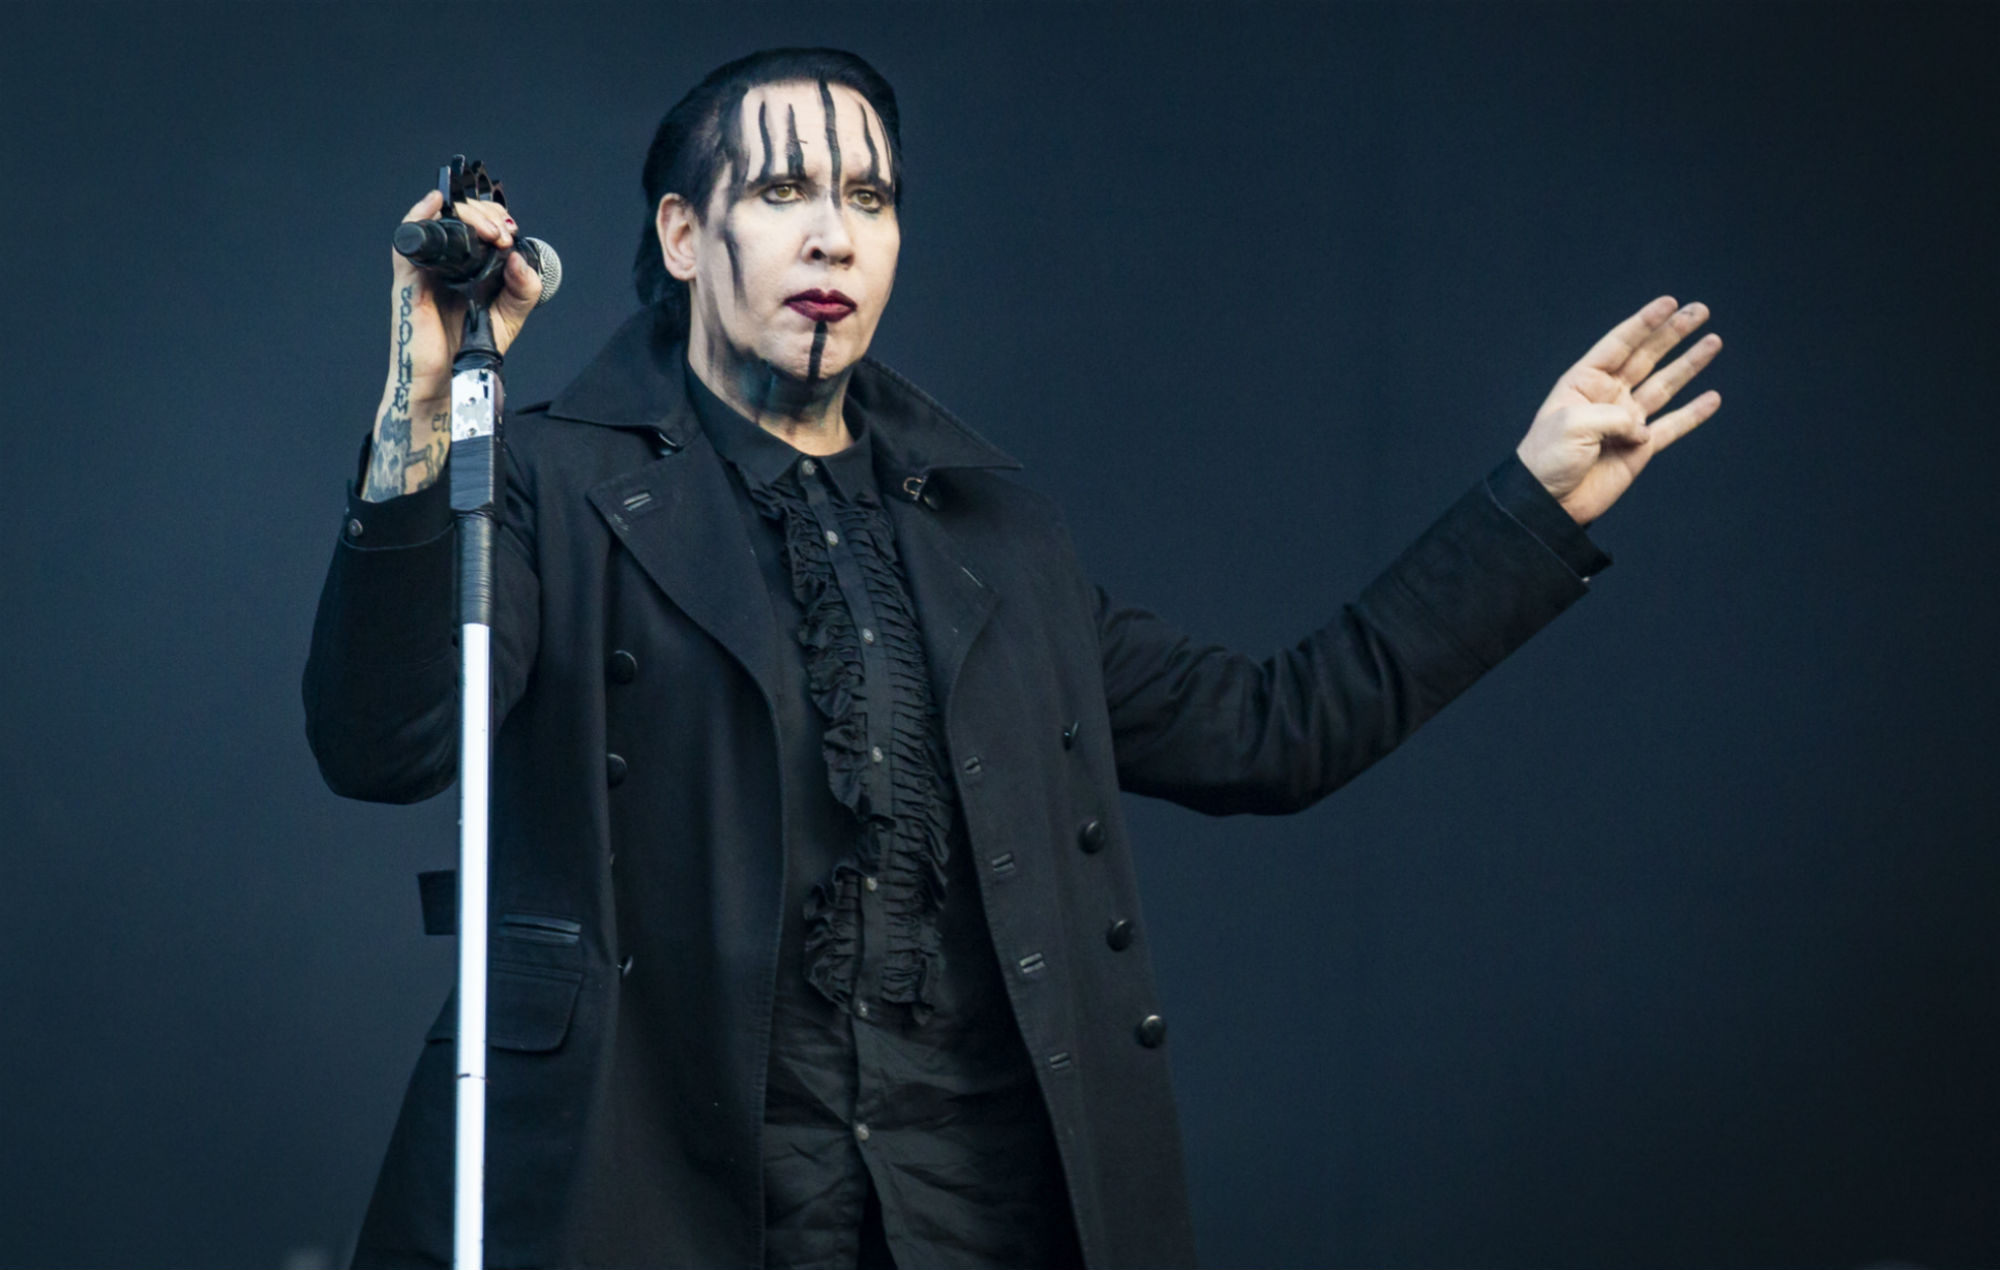 Marilyn Manson Wacken 2019